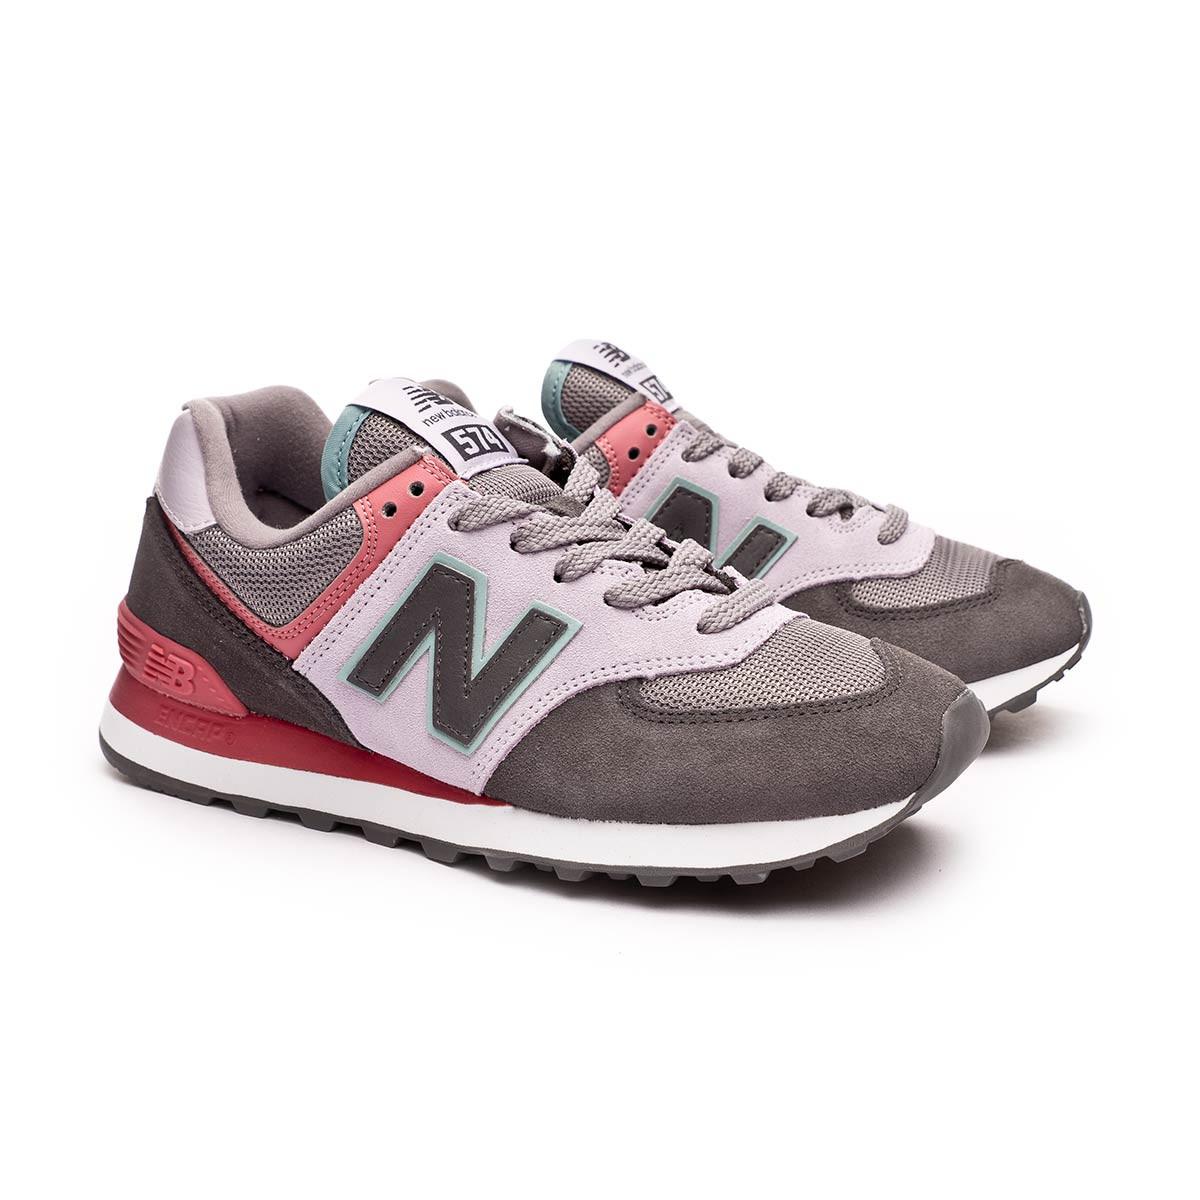 New Balance Classic Running 574 v2 Mujer Trainers